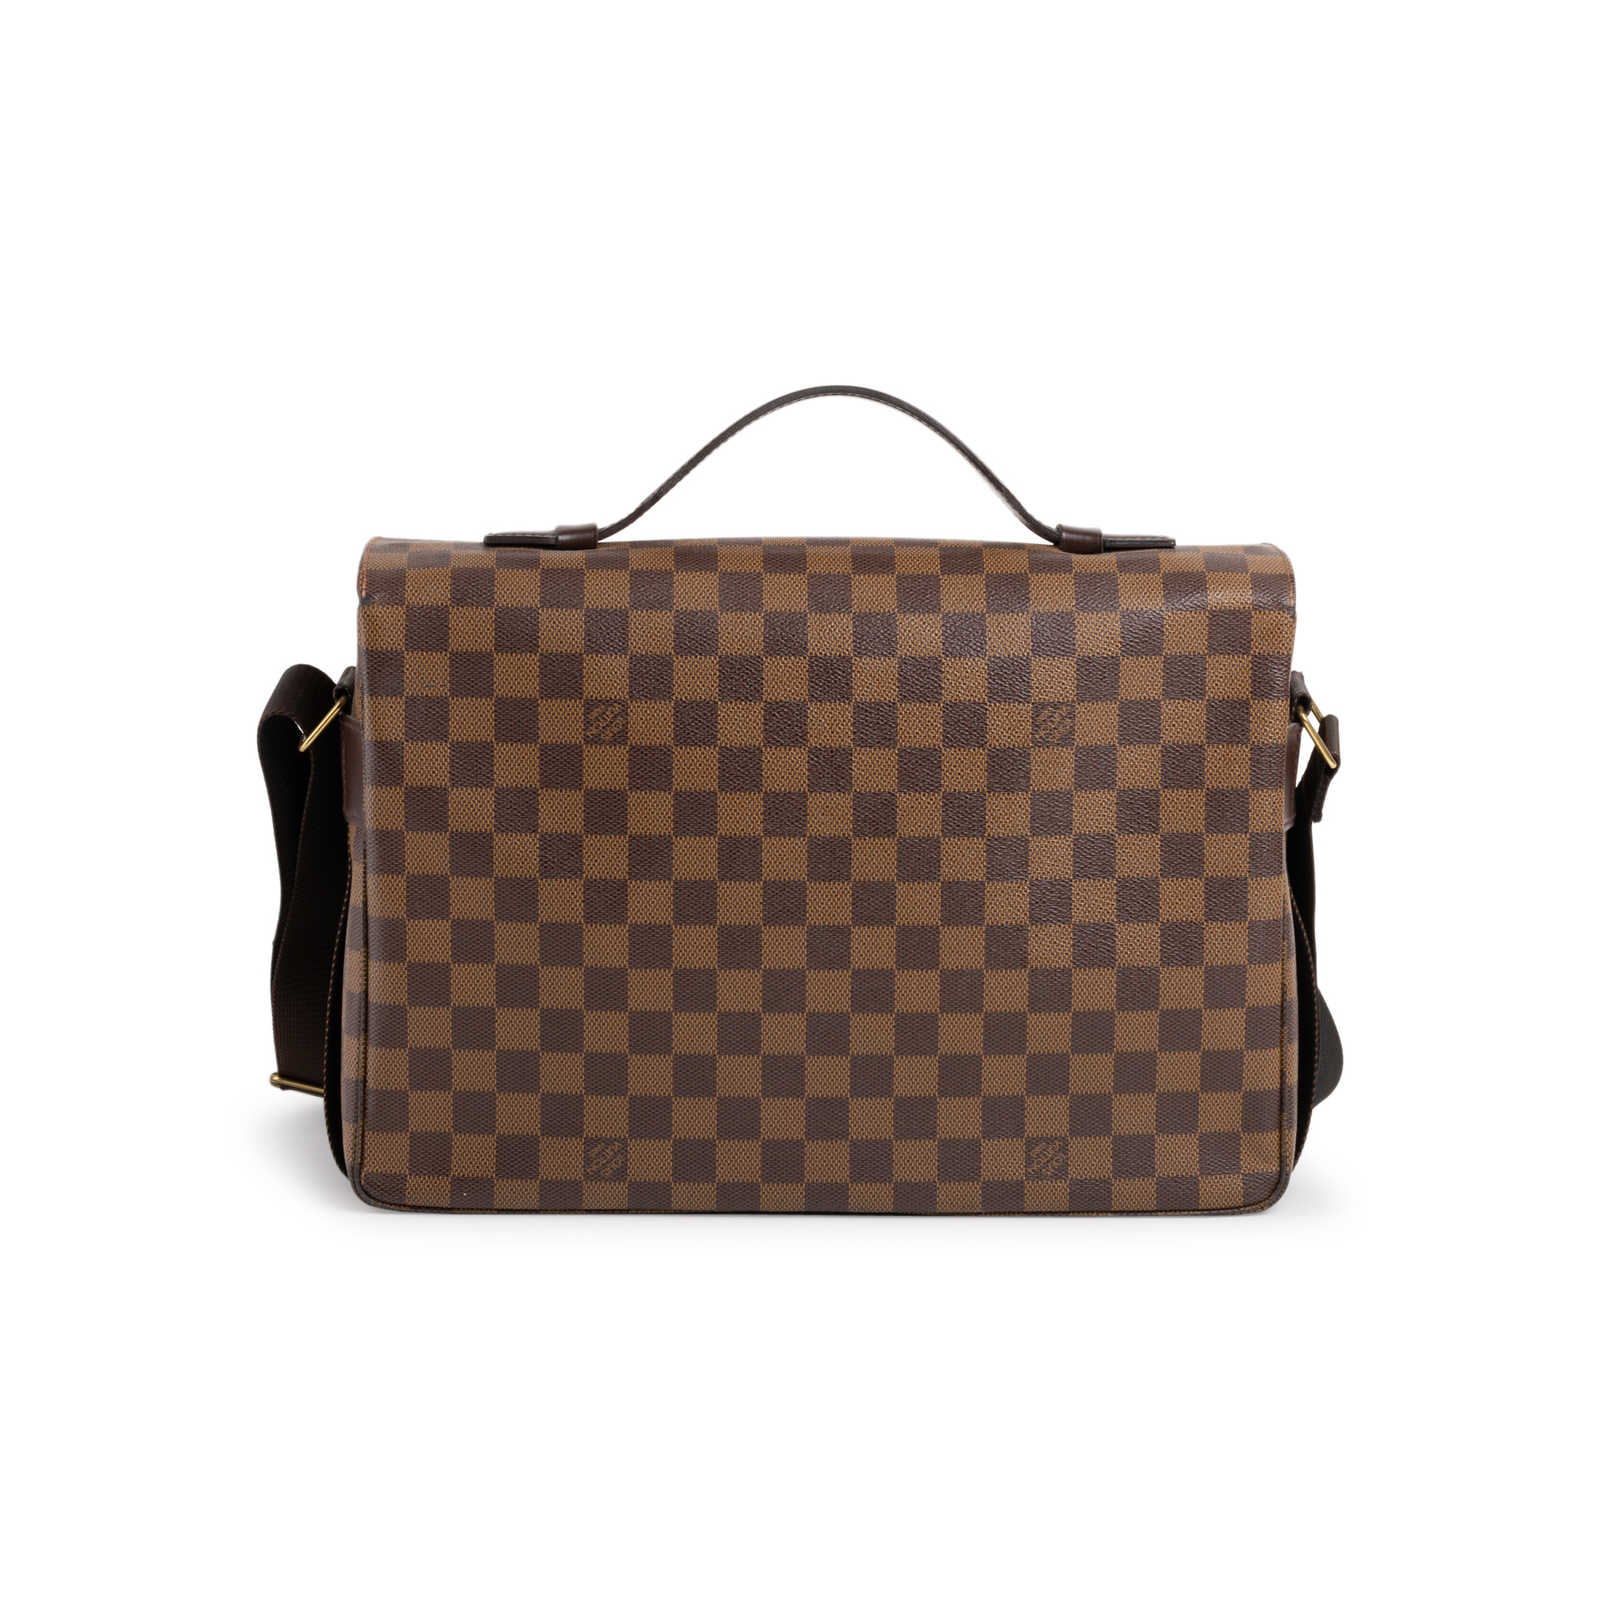 6770db3e112 ... Authentic Second Hand Louis Vuitton Damier Ebene Broadway Messenger Bag  (PSS-613-00019 ...